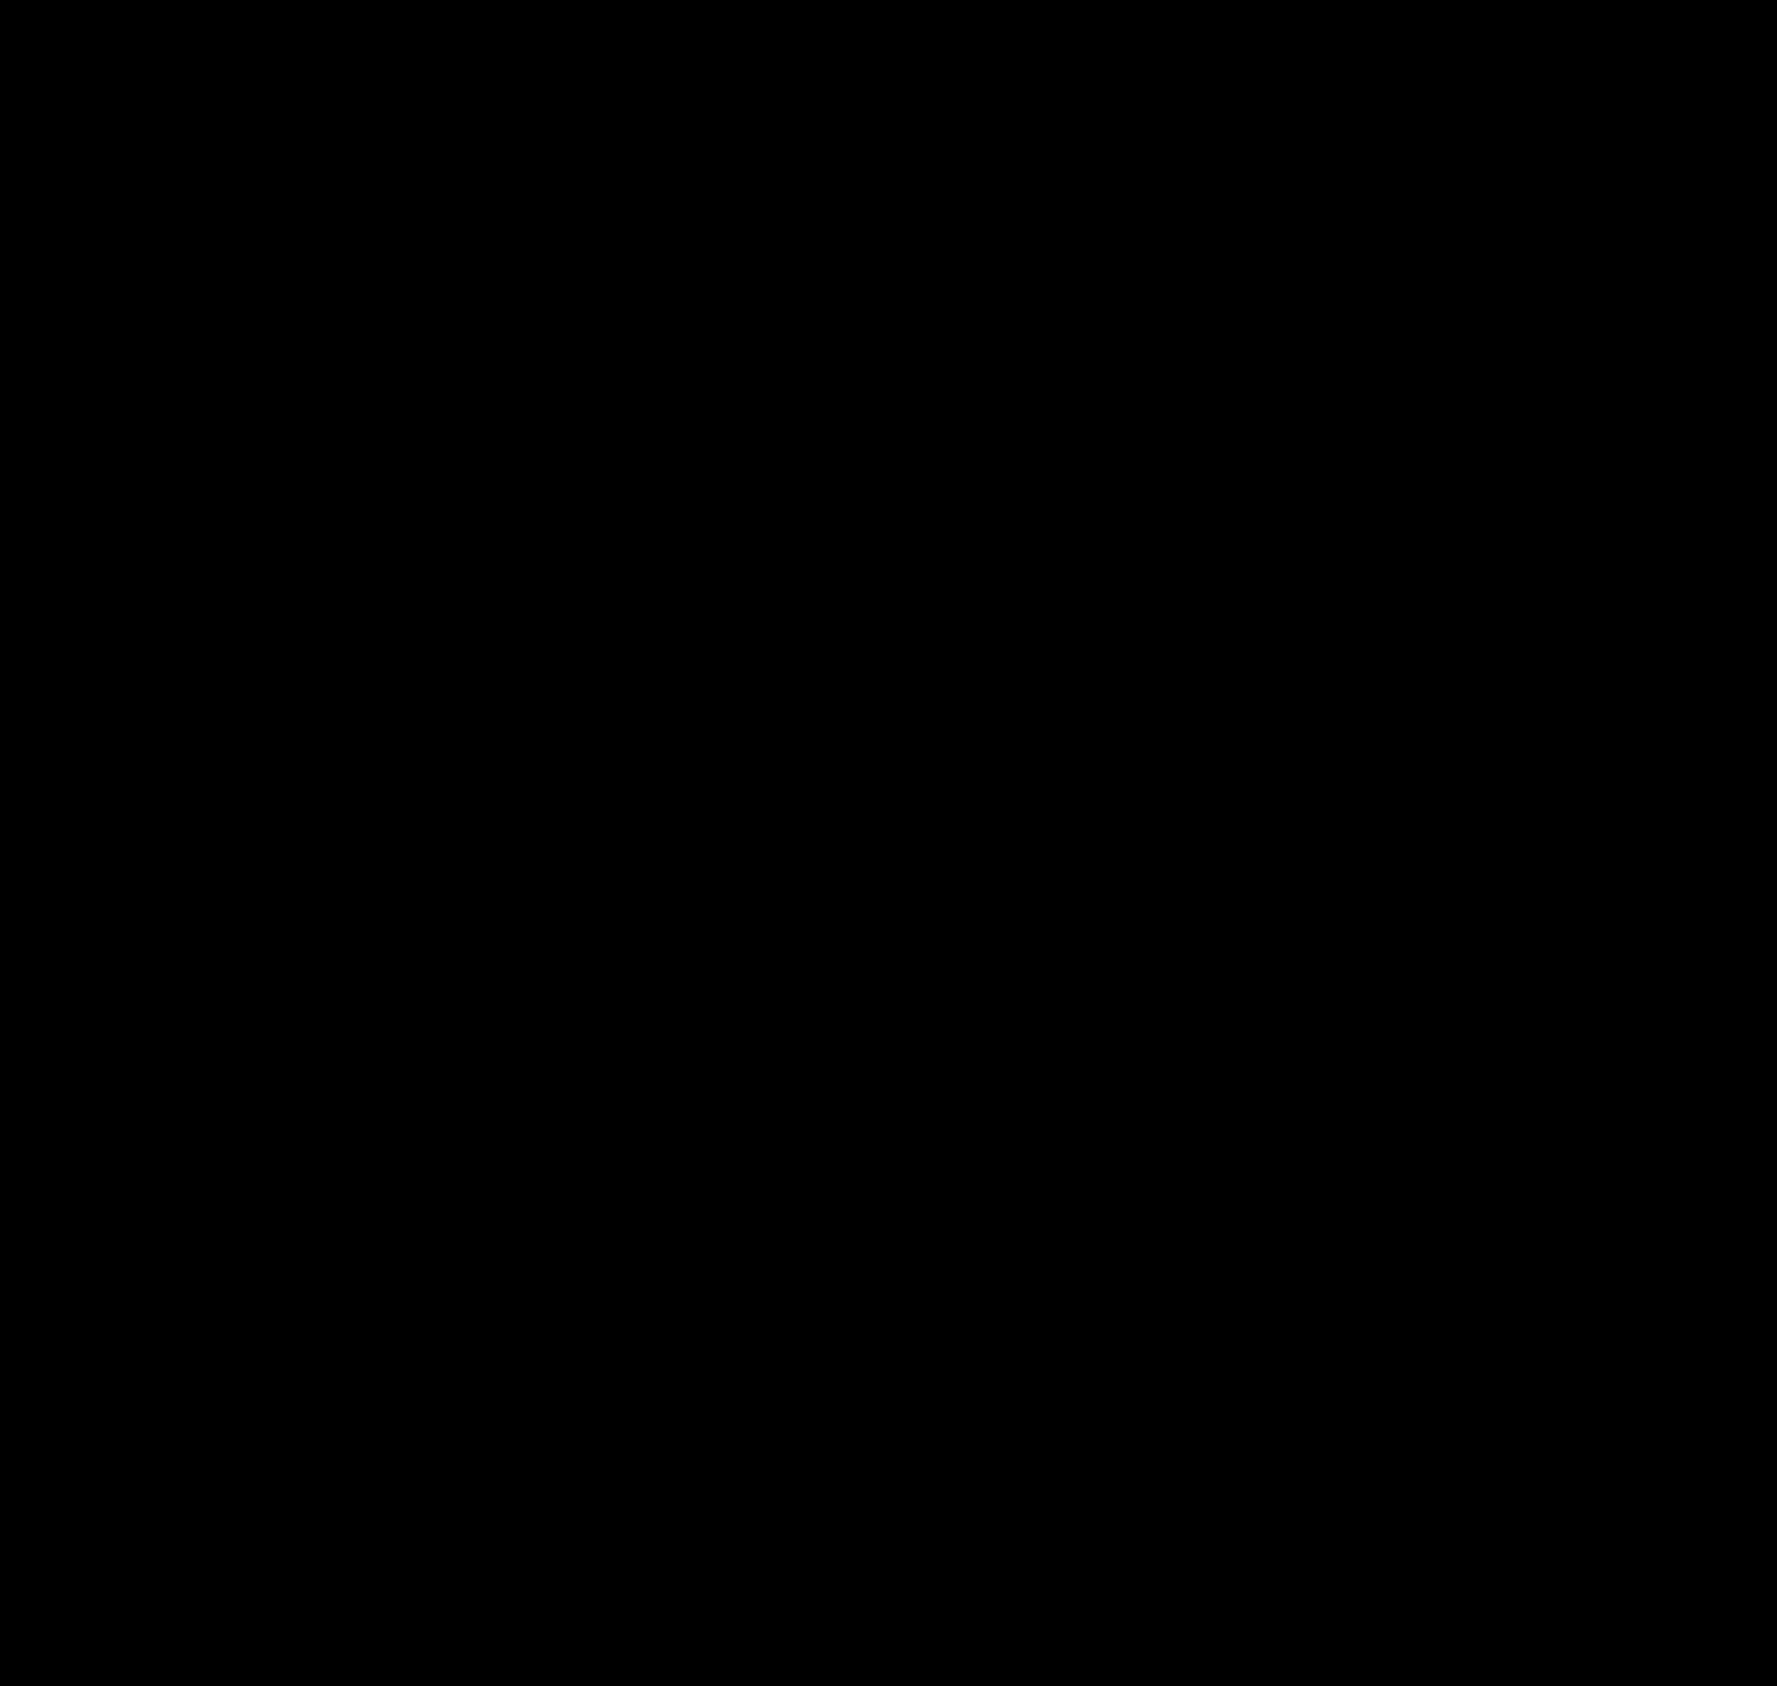 ALi Gallefoss